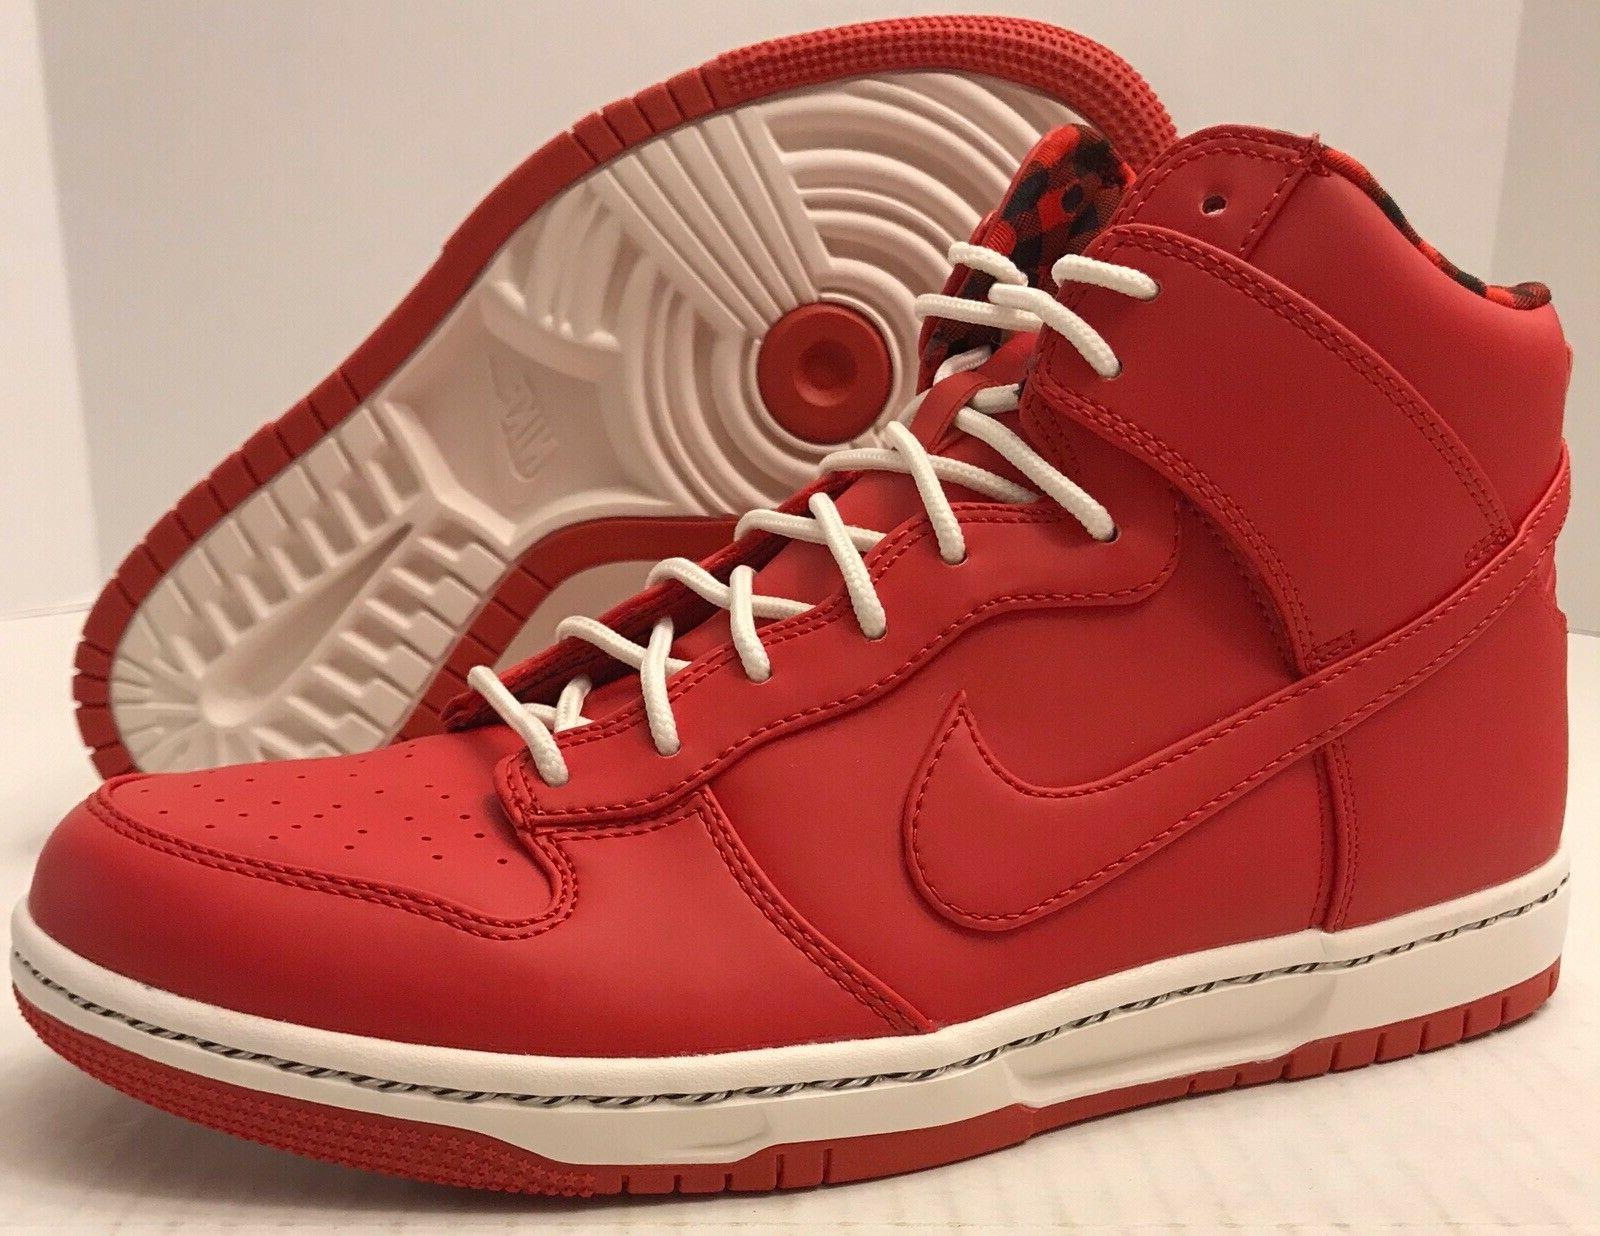 Nike Dunk Ultra Red Racer Rain Jacket Casual Sneaker New 845